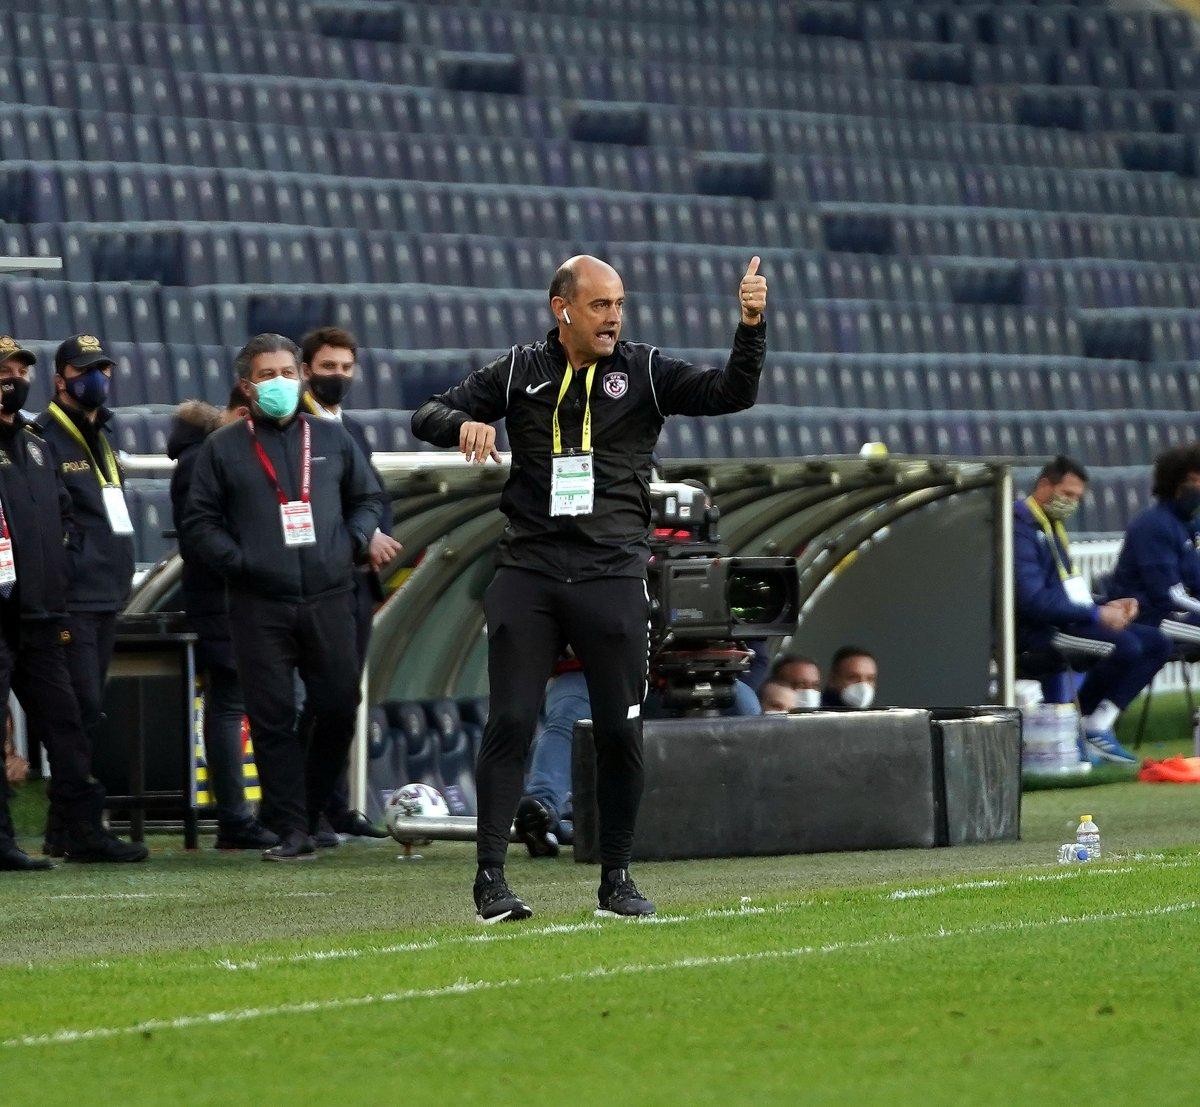 Fenerbahçe evinde Gaziantep i 3 golle mağlup etti #7